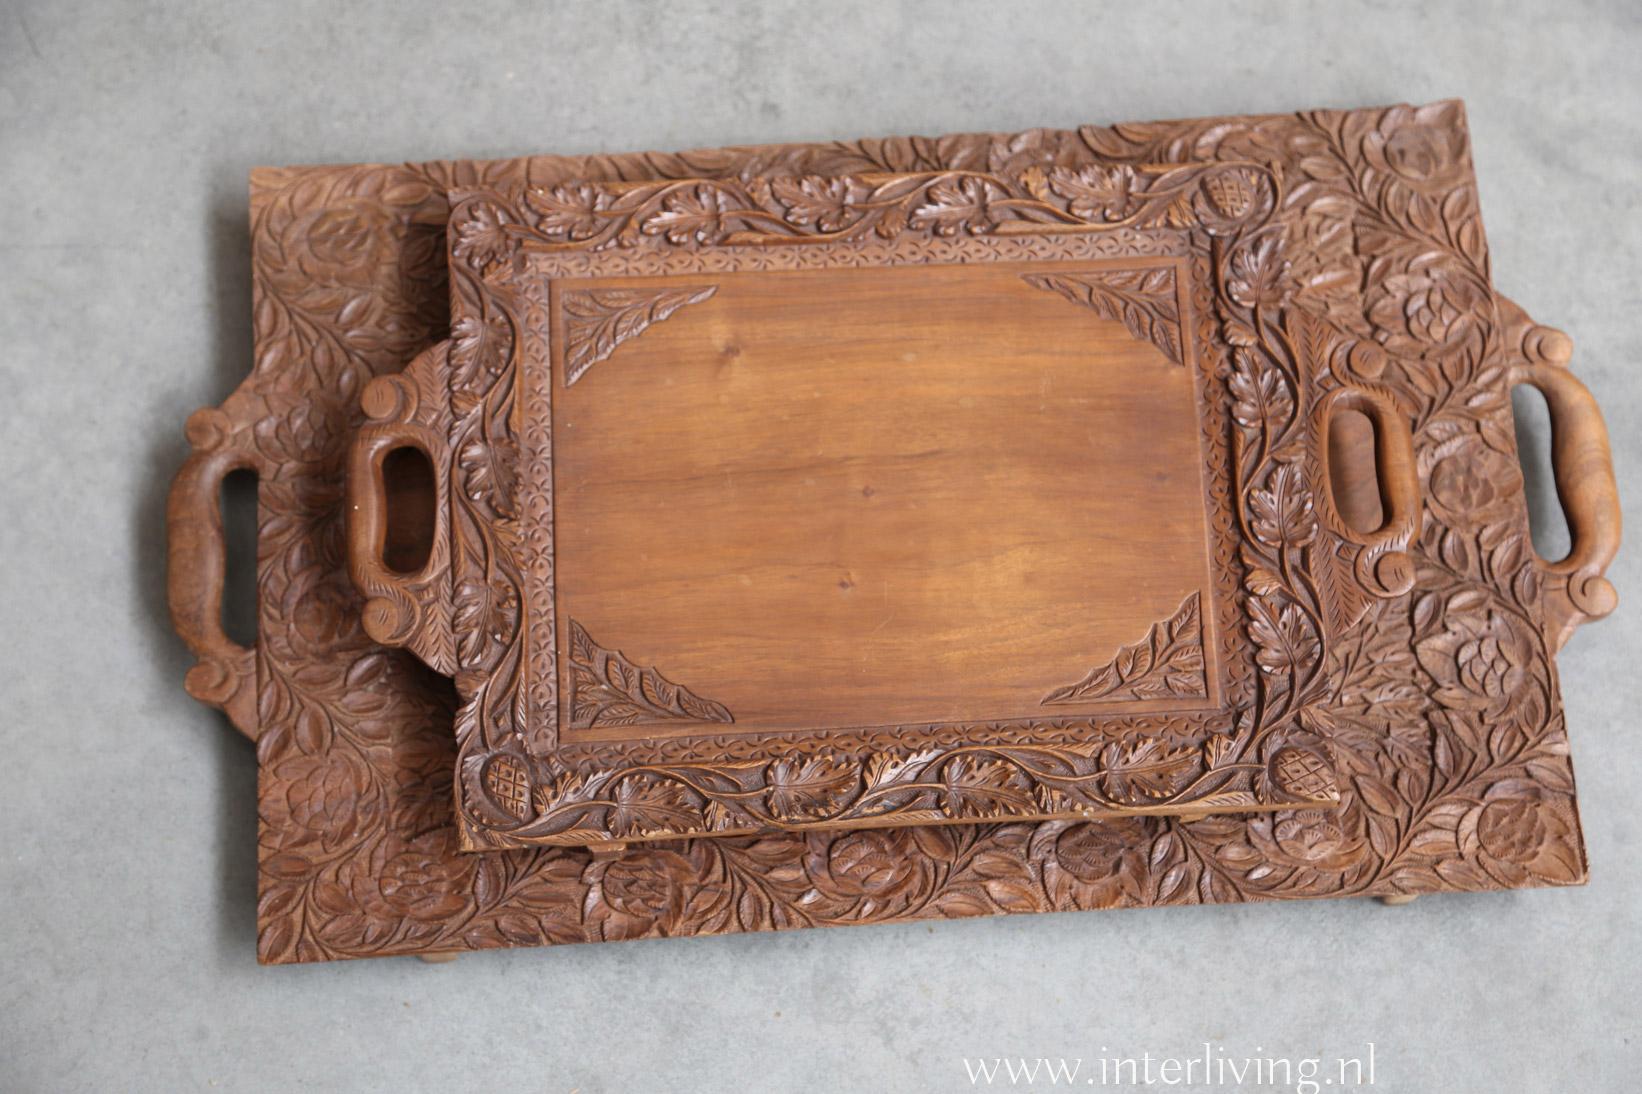 oosters dienblad op pootjes - vintage hout - bewerkt blad - rechthoek model - styling voor huis